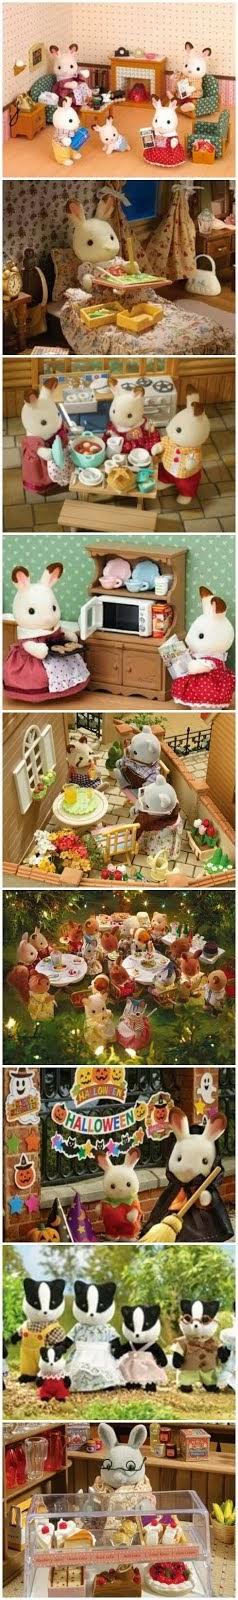 """Sylvanian Families"" Doll House & Toys ^0^"